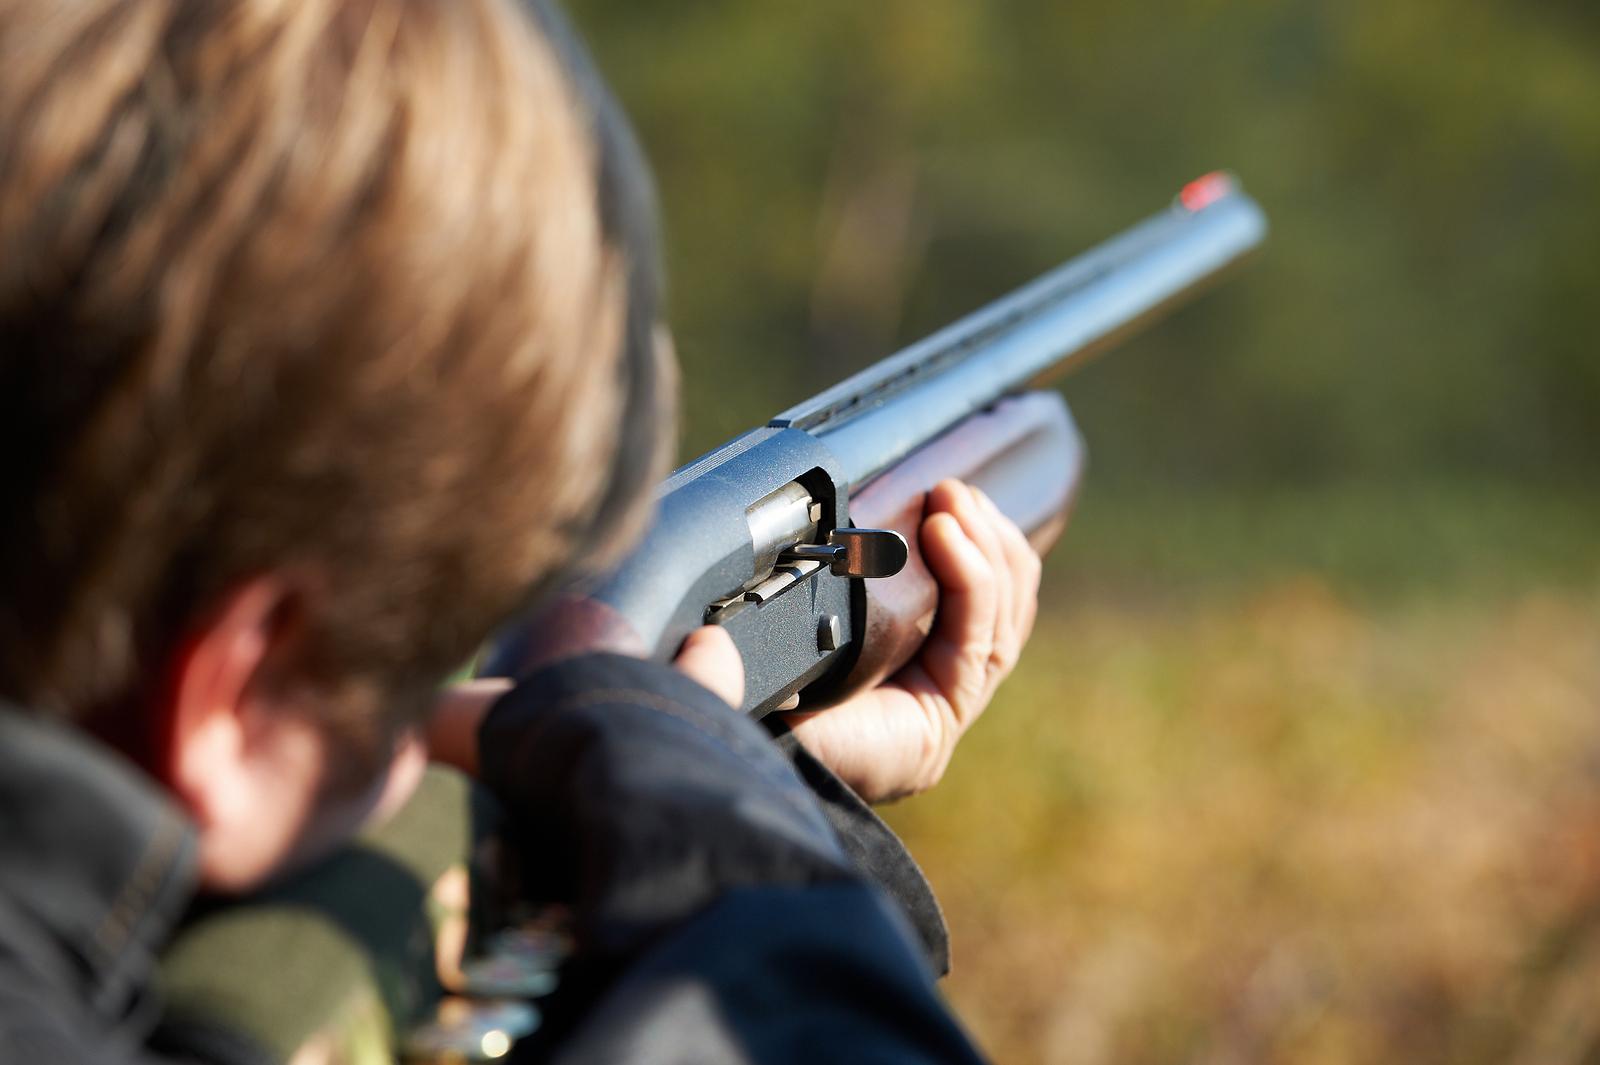 bigstock-Shooter-Takes-Aim-For-Shot-54532055.jpg